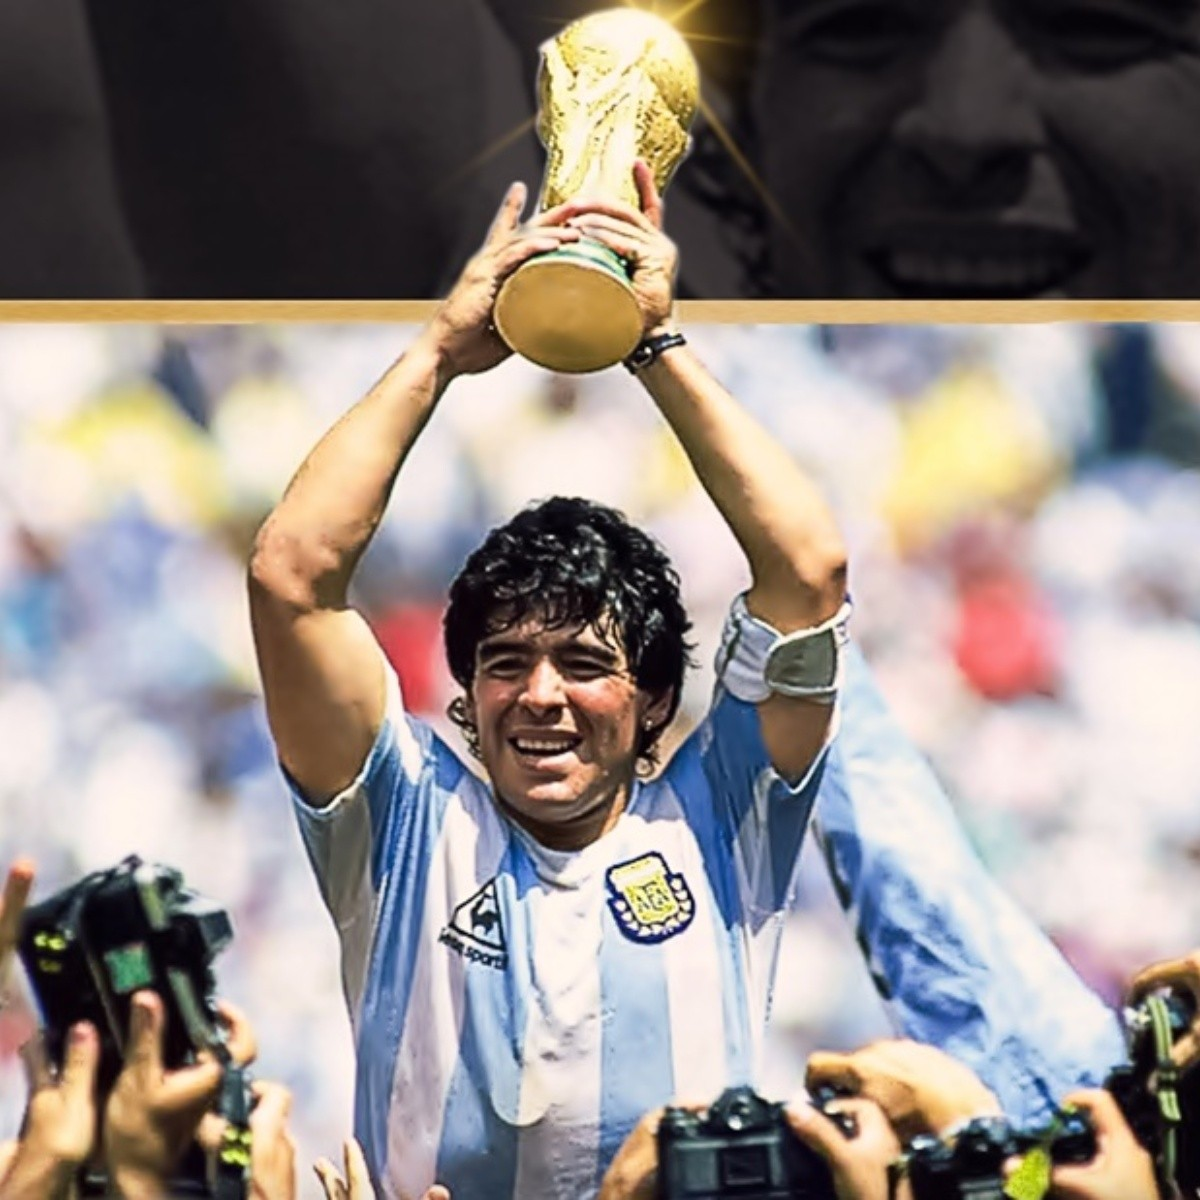 Fallece Diego Armando Maradona 1